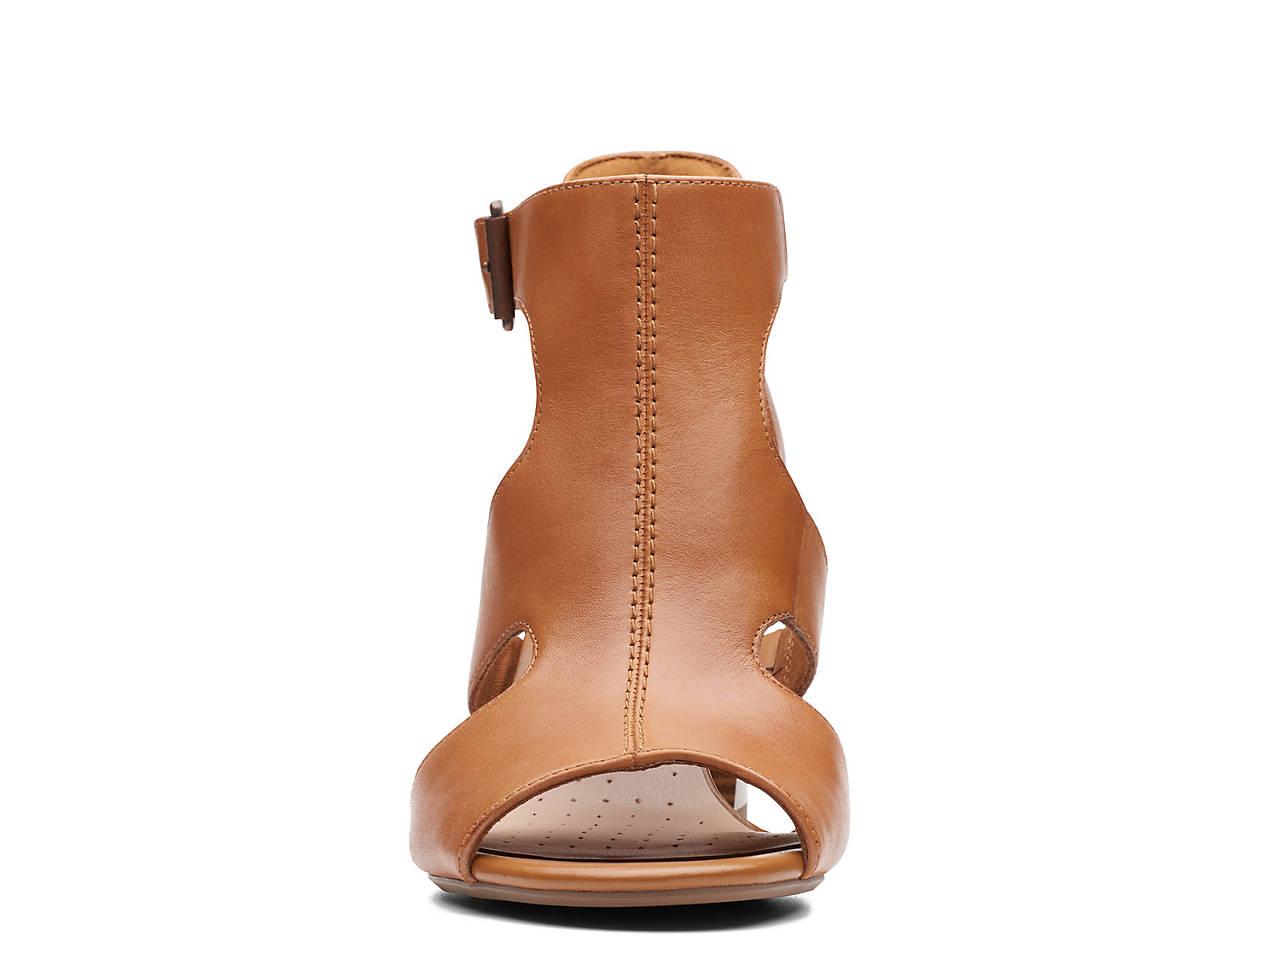 Clarks Deva Heidi Sandal Women's Shoes | DSW